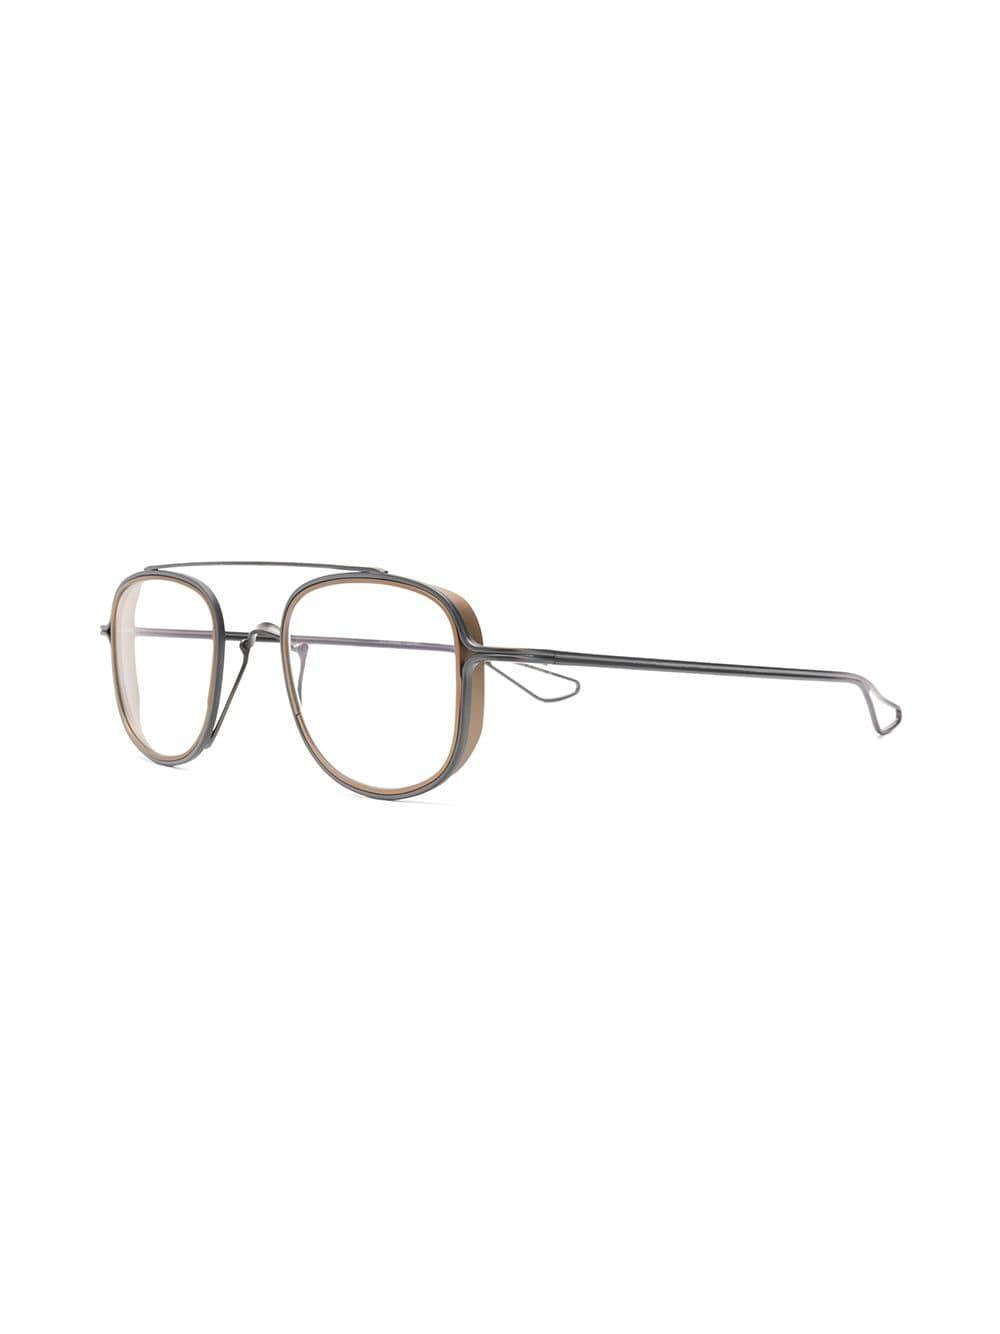 5b519f45a5c Lyst - Dita Eyewear Tessel Glasses A Thin in Metallic